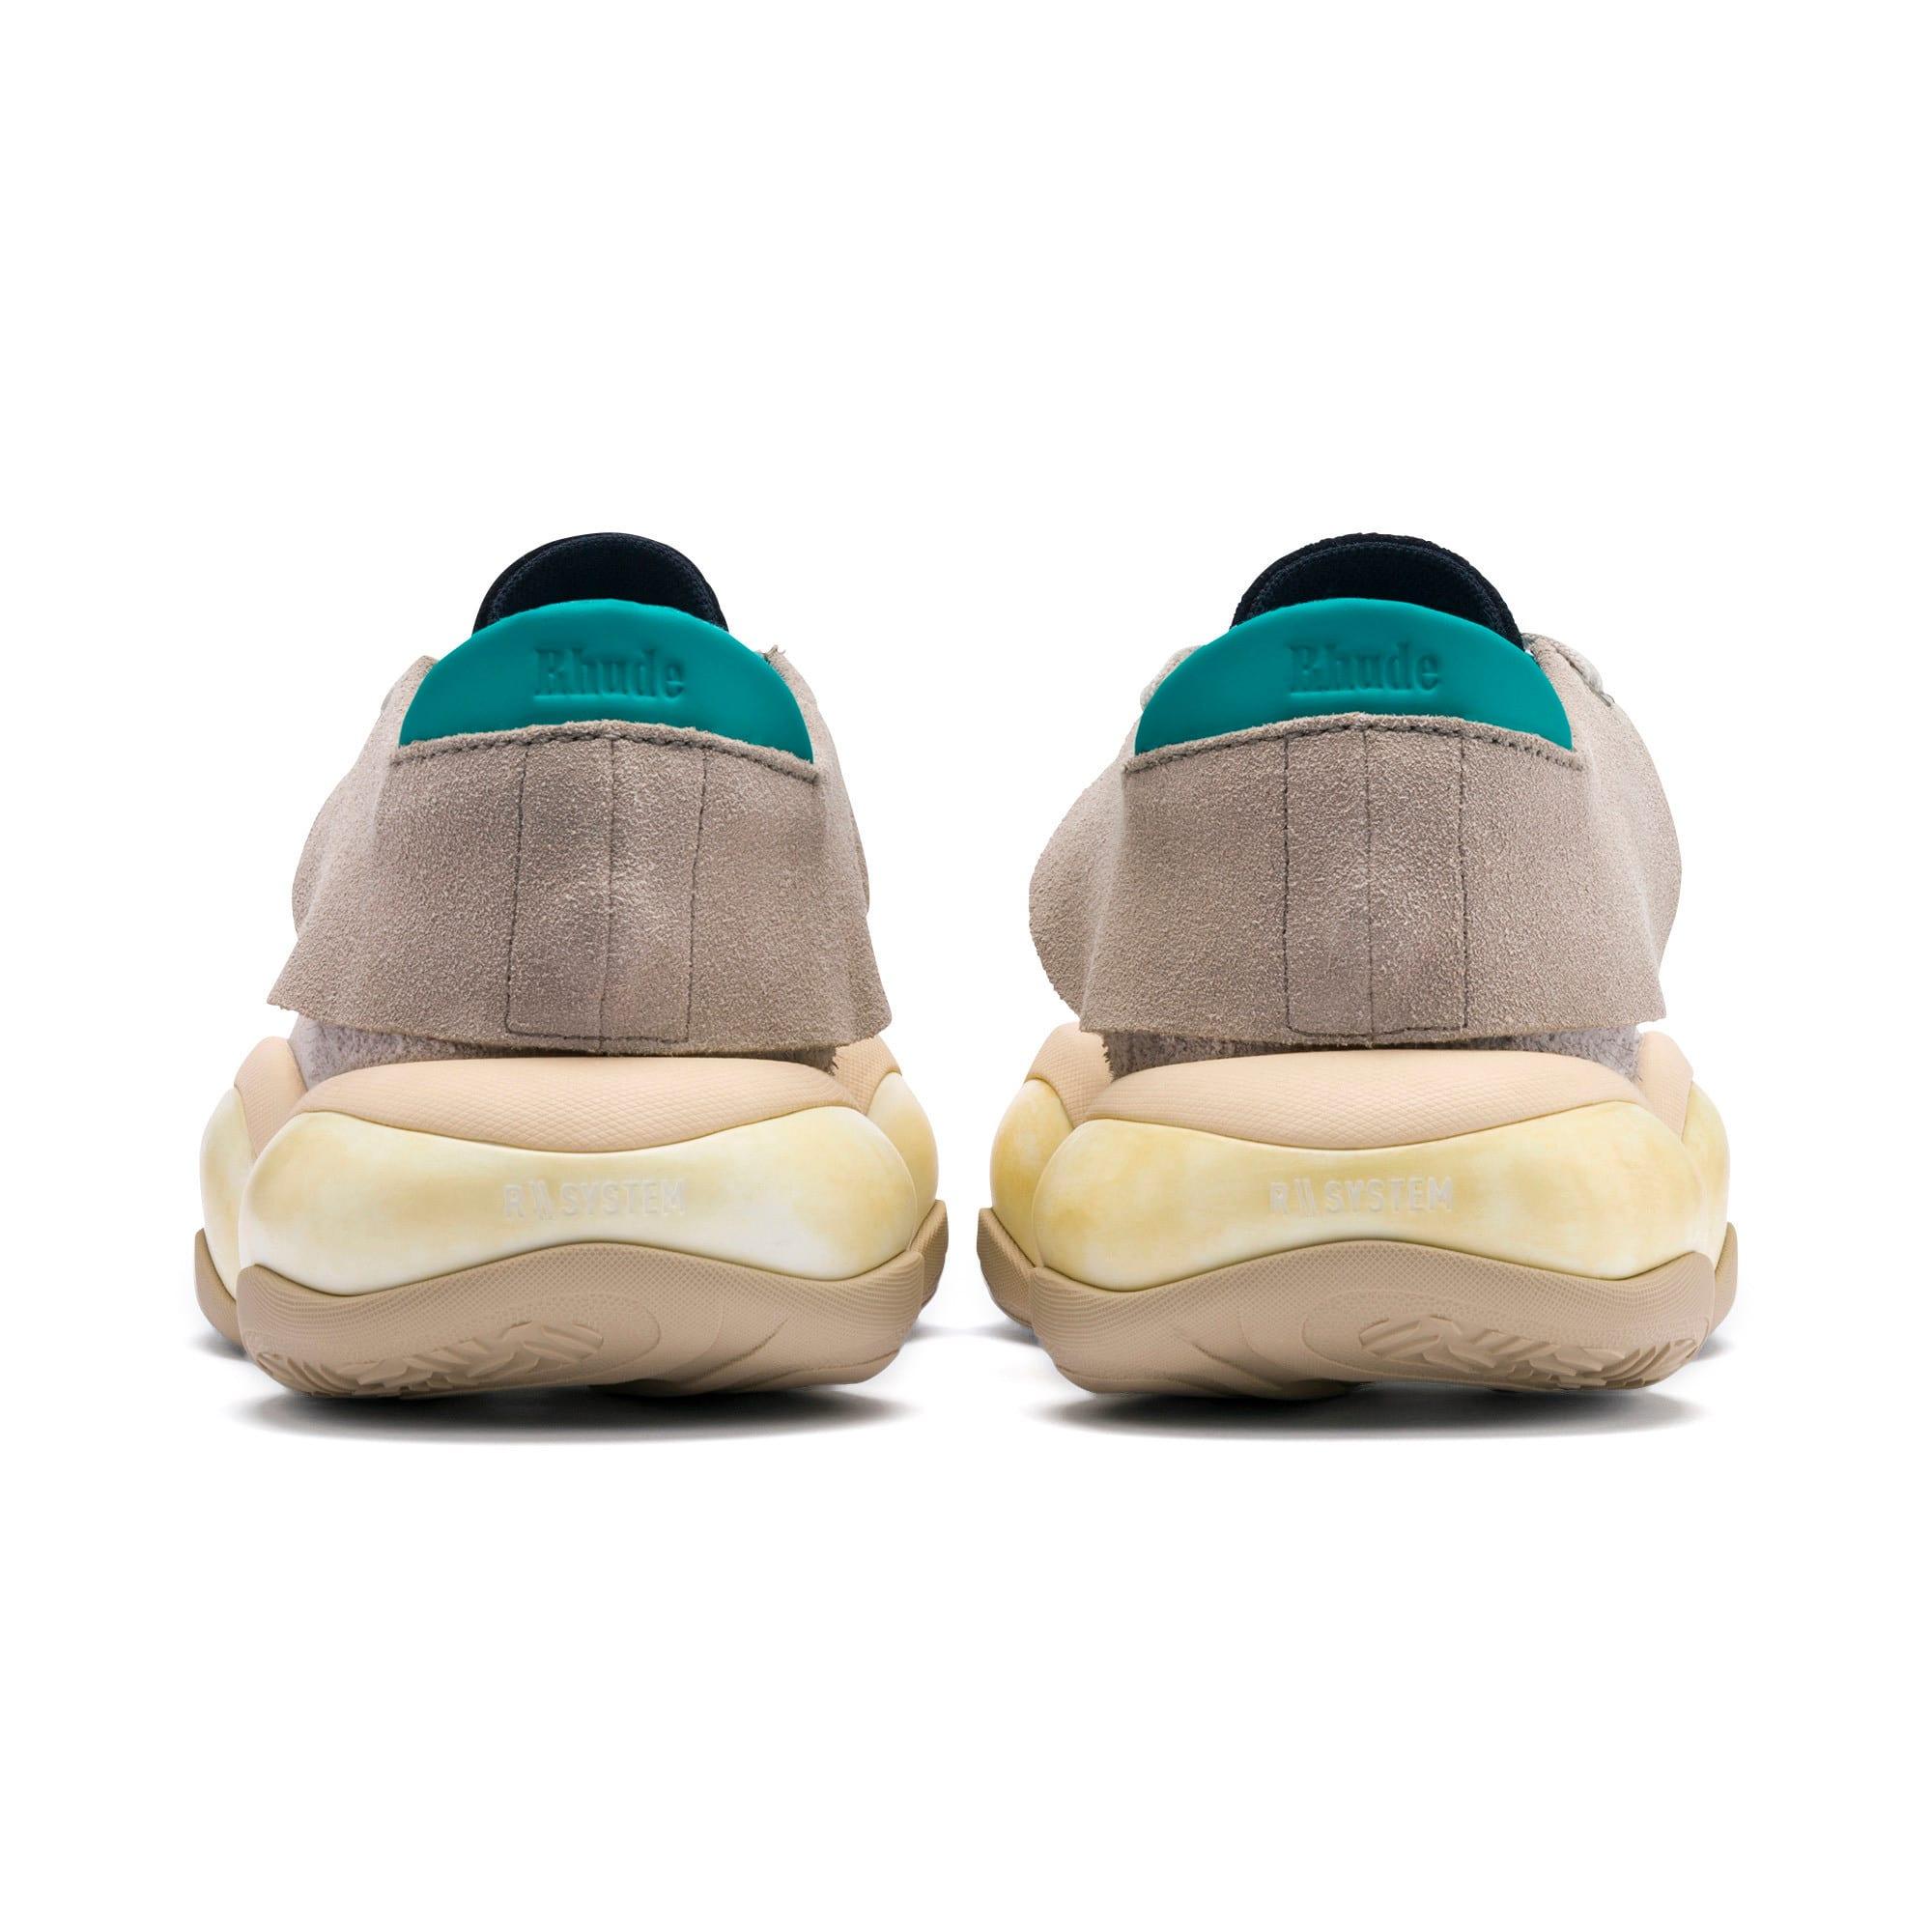 Thumbnail 3 of PUMA x RHUDE Alteration Sneakers, Chinchilla-Whisper White, medium